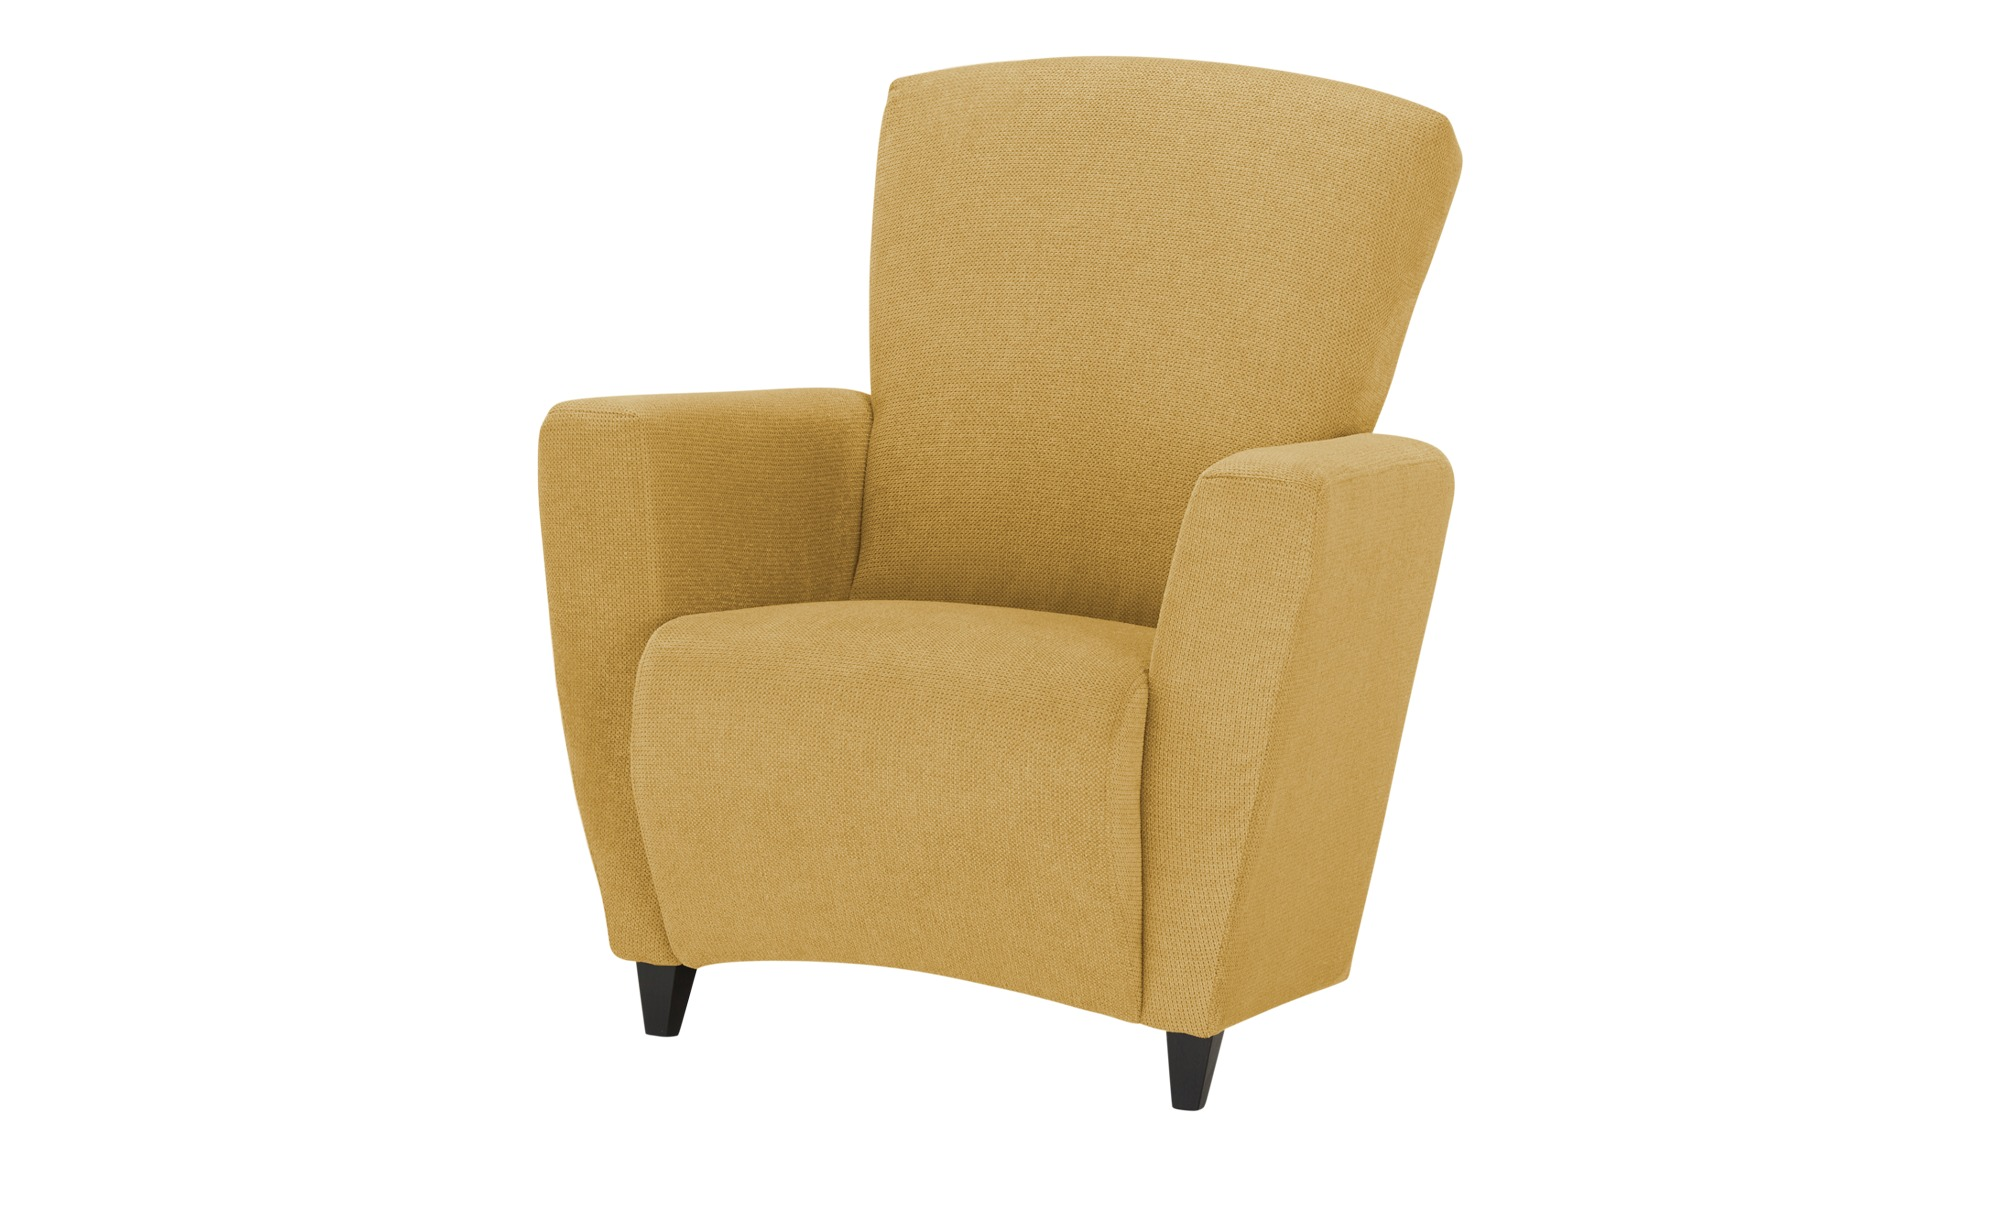 smart Sessel  Alma ¦ gelb ¦ Maße (cm): B: 84 H: 94 T: 80 Polstermöbel > Sessel > Polstersessel - Höffner